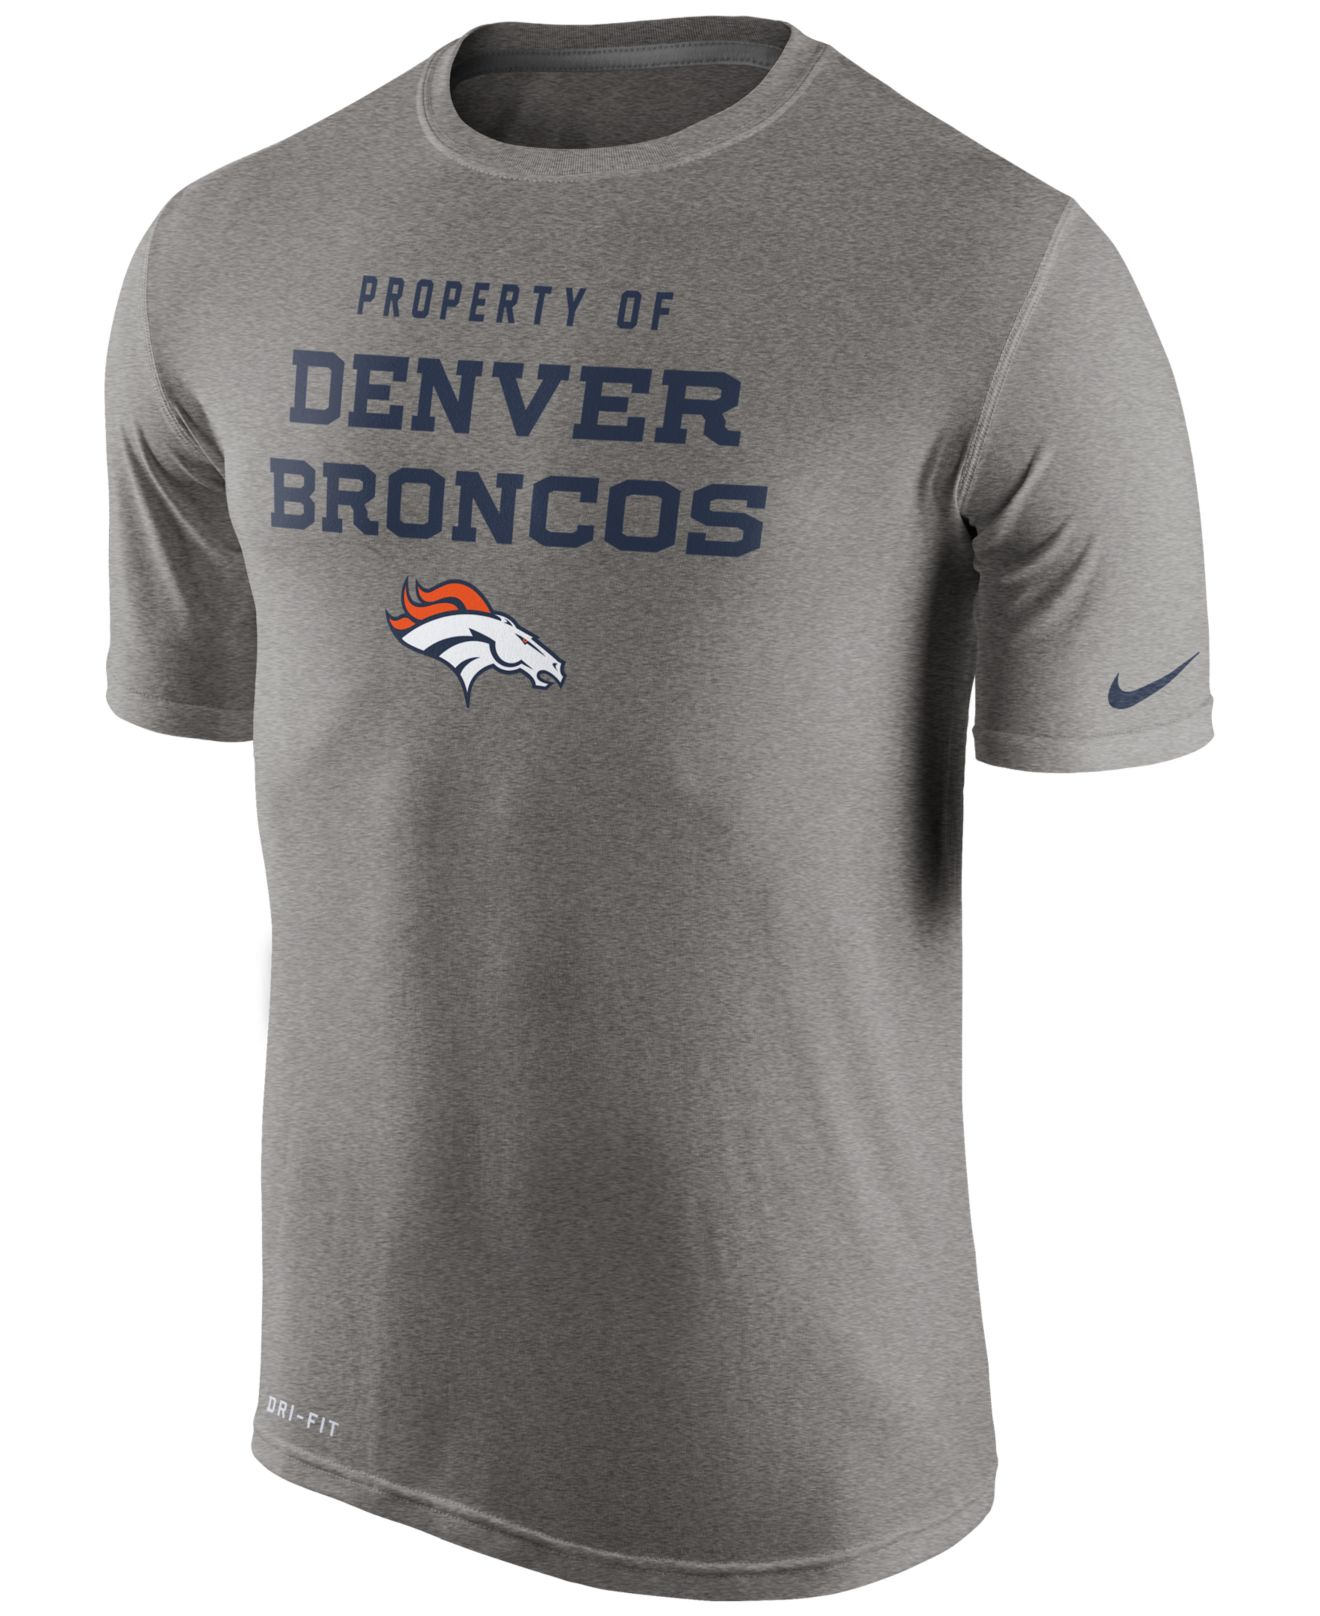 73e676f2d29 ... Nike Mens Denver Broncos Legend Property Of T-shirt in Gray ...